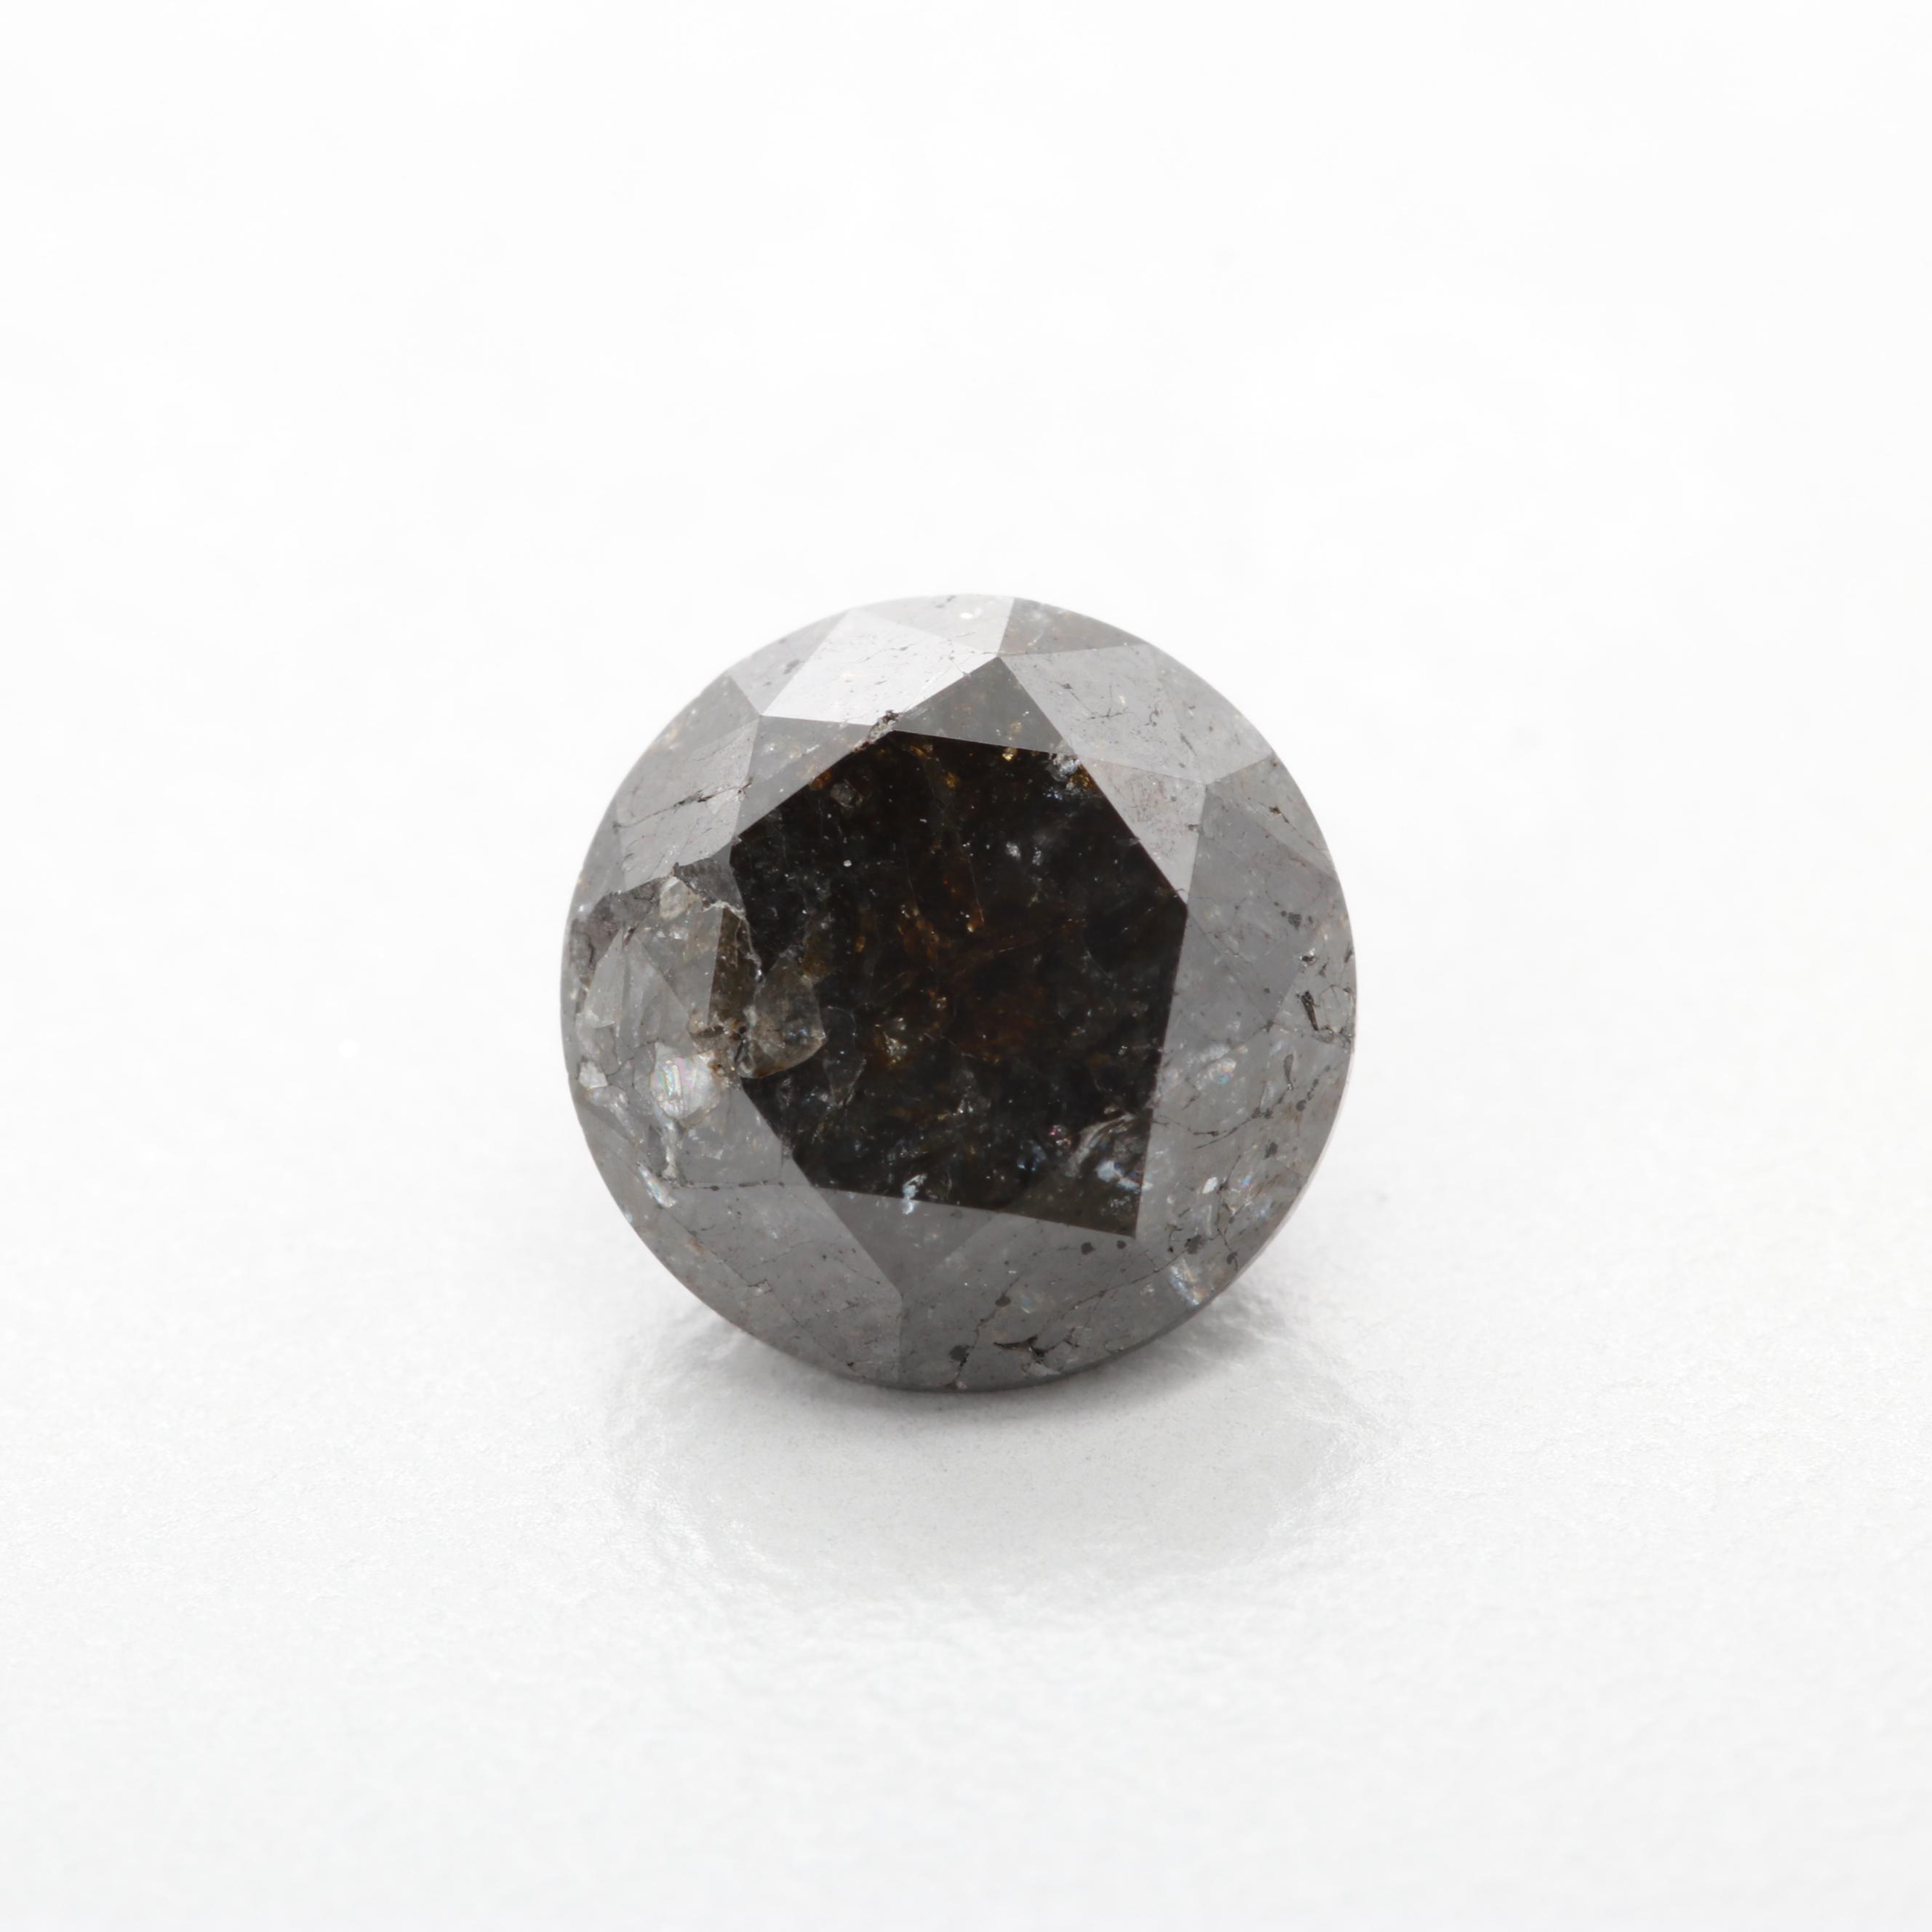 Loose 2.52 CT Black Diamond